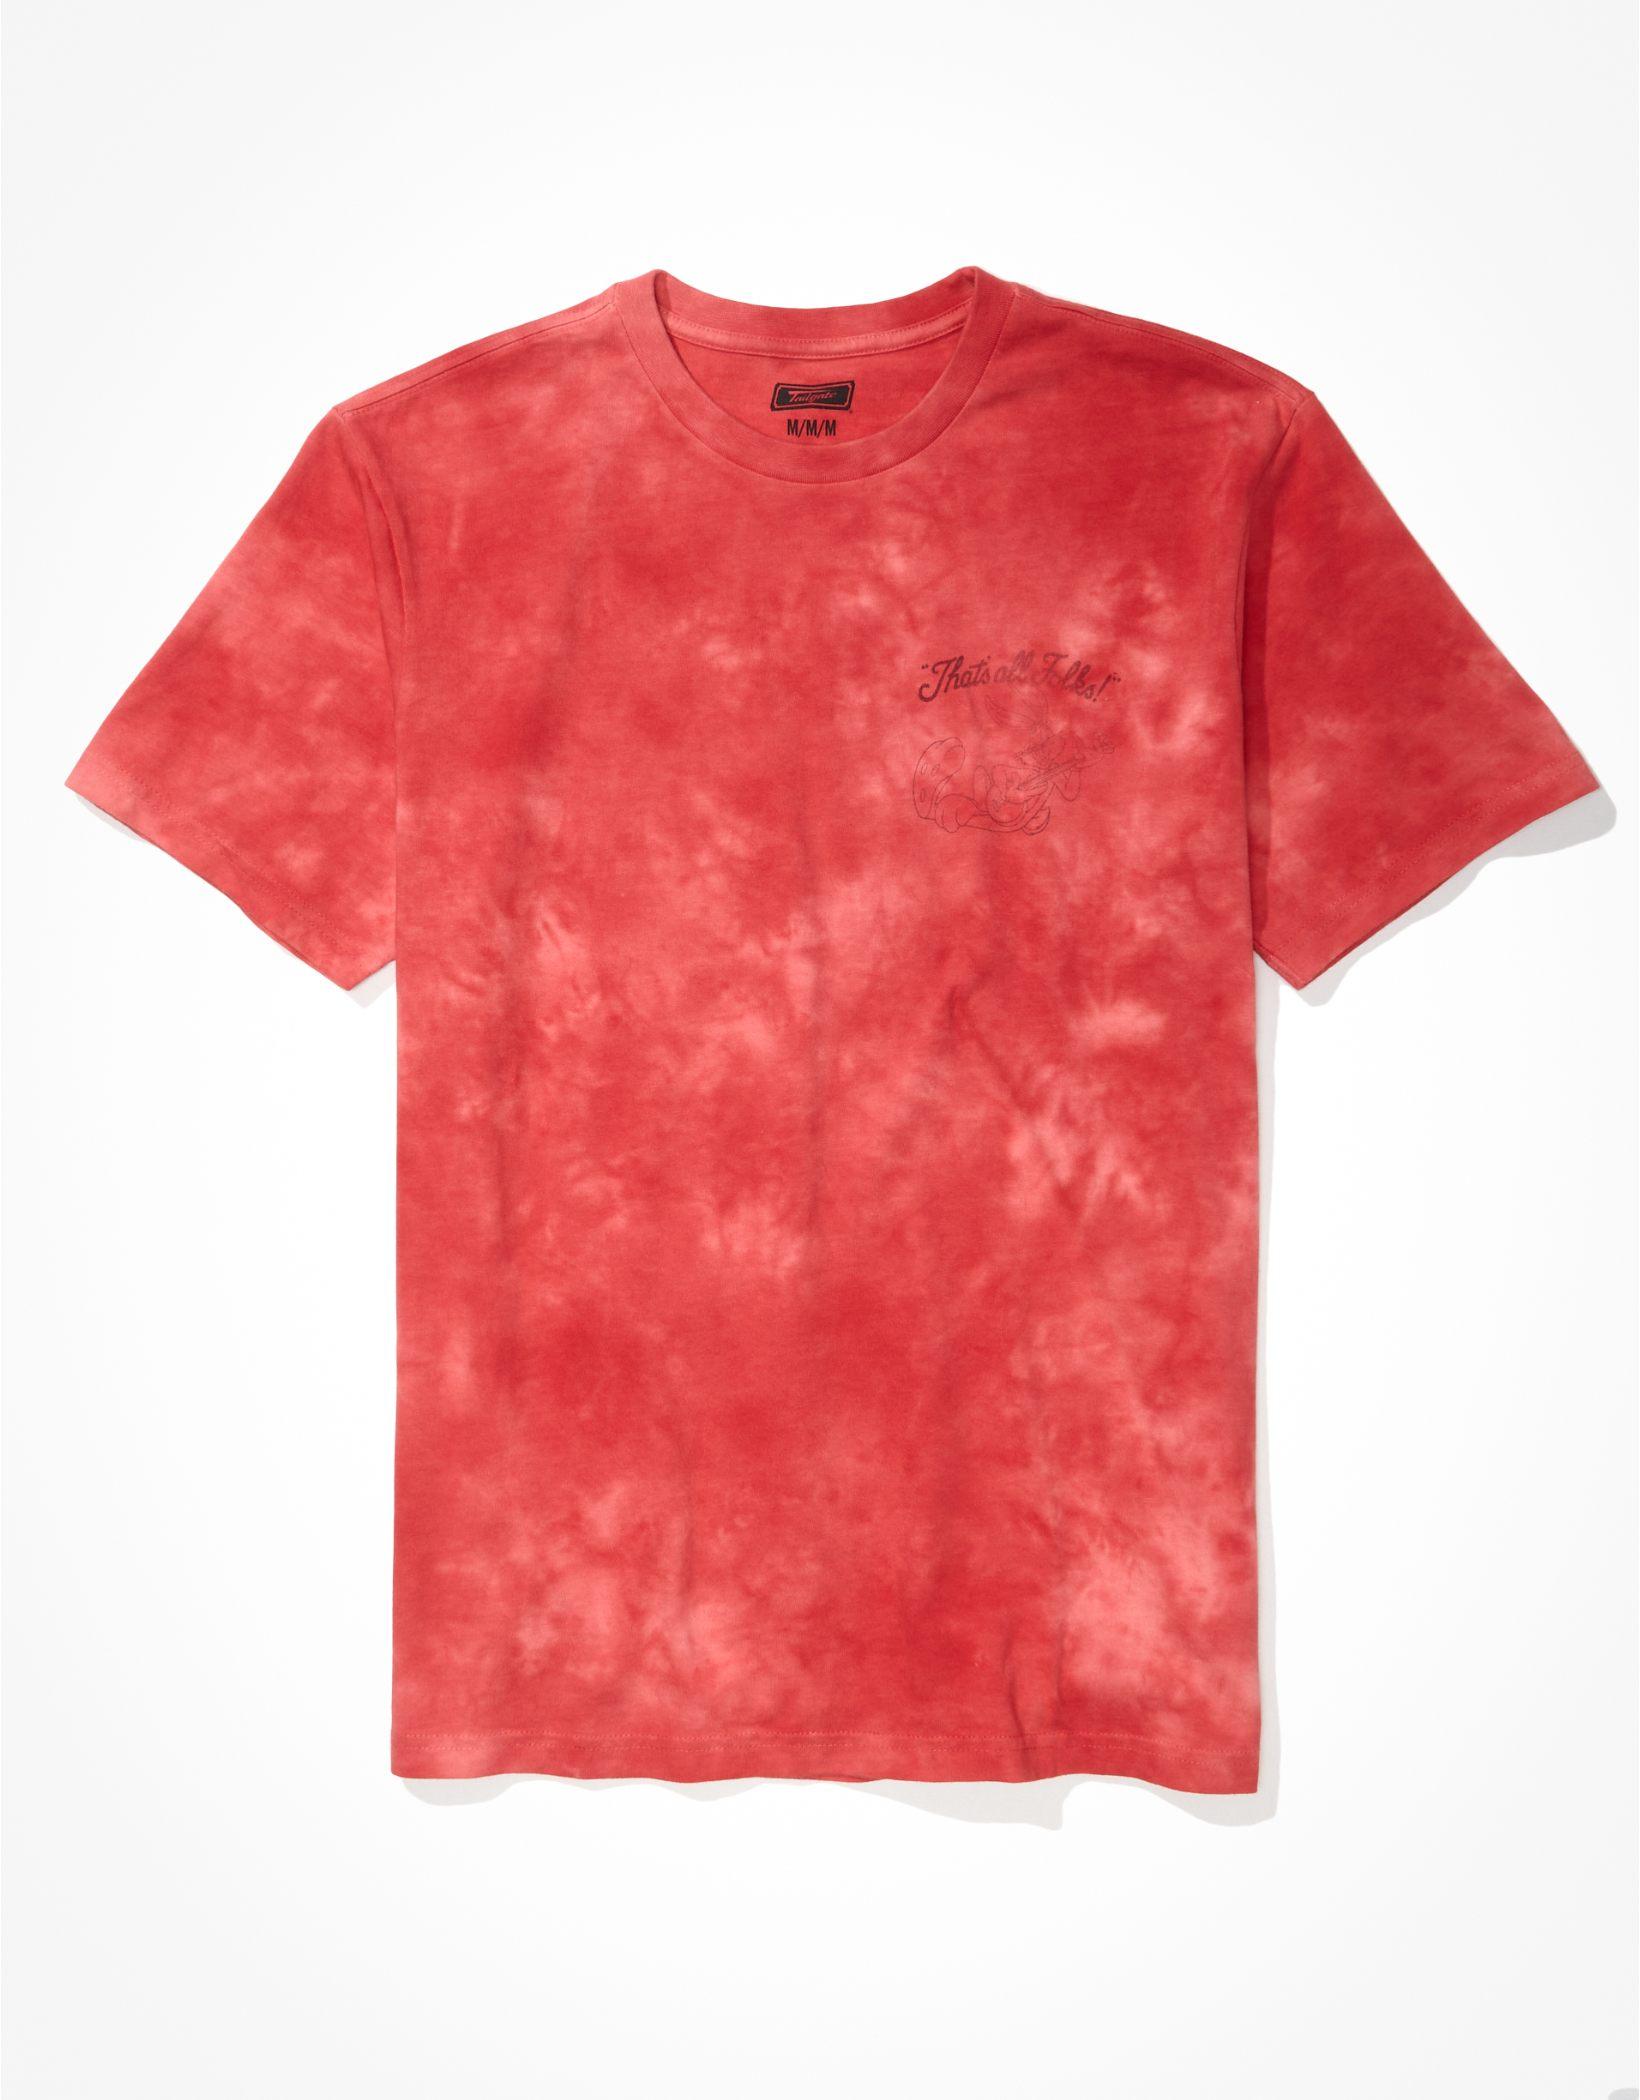 Tailgate Men's Looney Tunes Tie-Dye Graphic T-Shirt